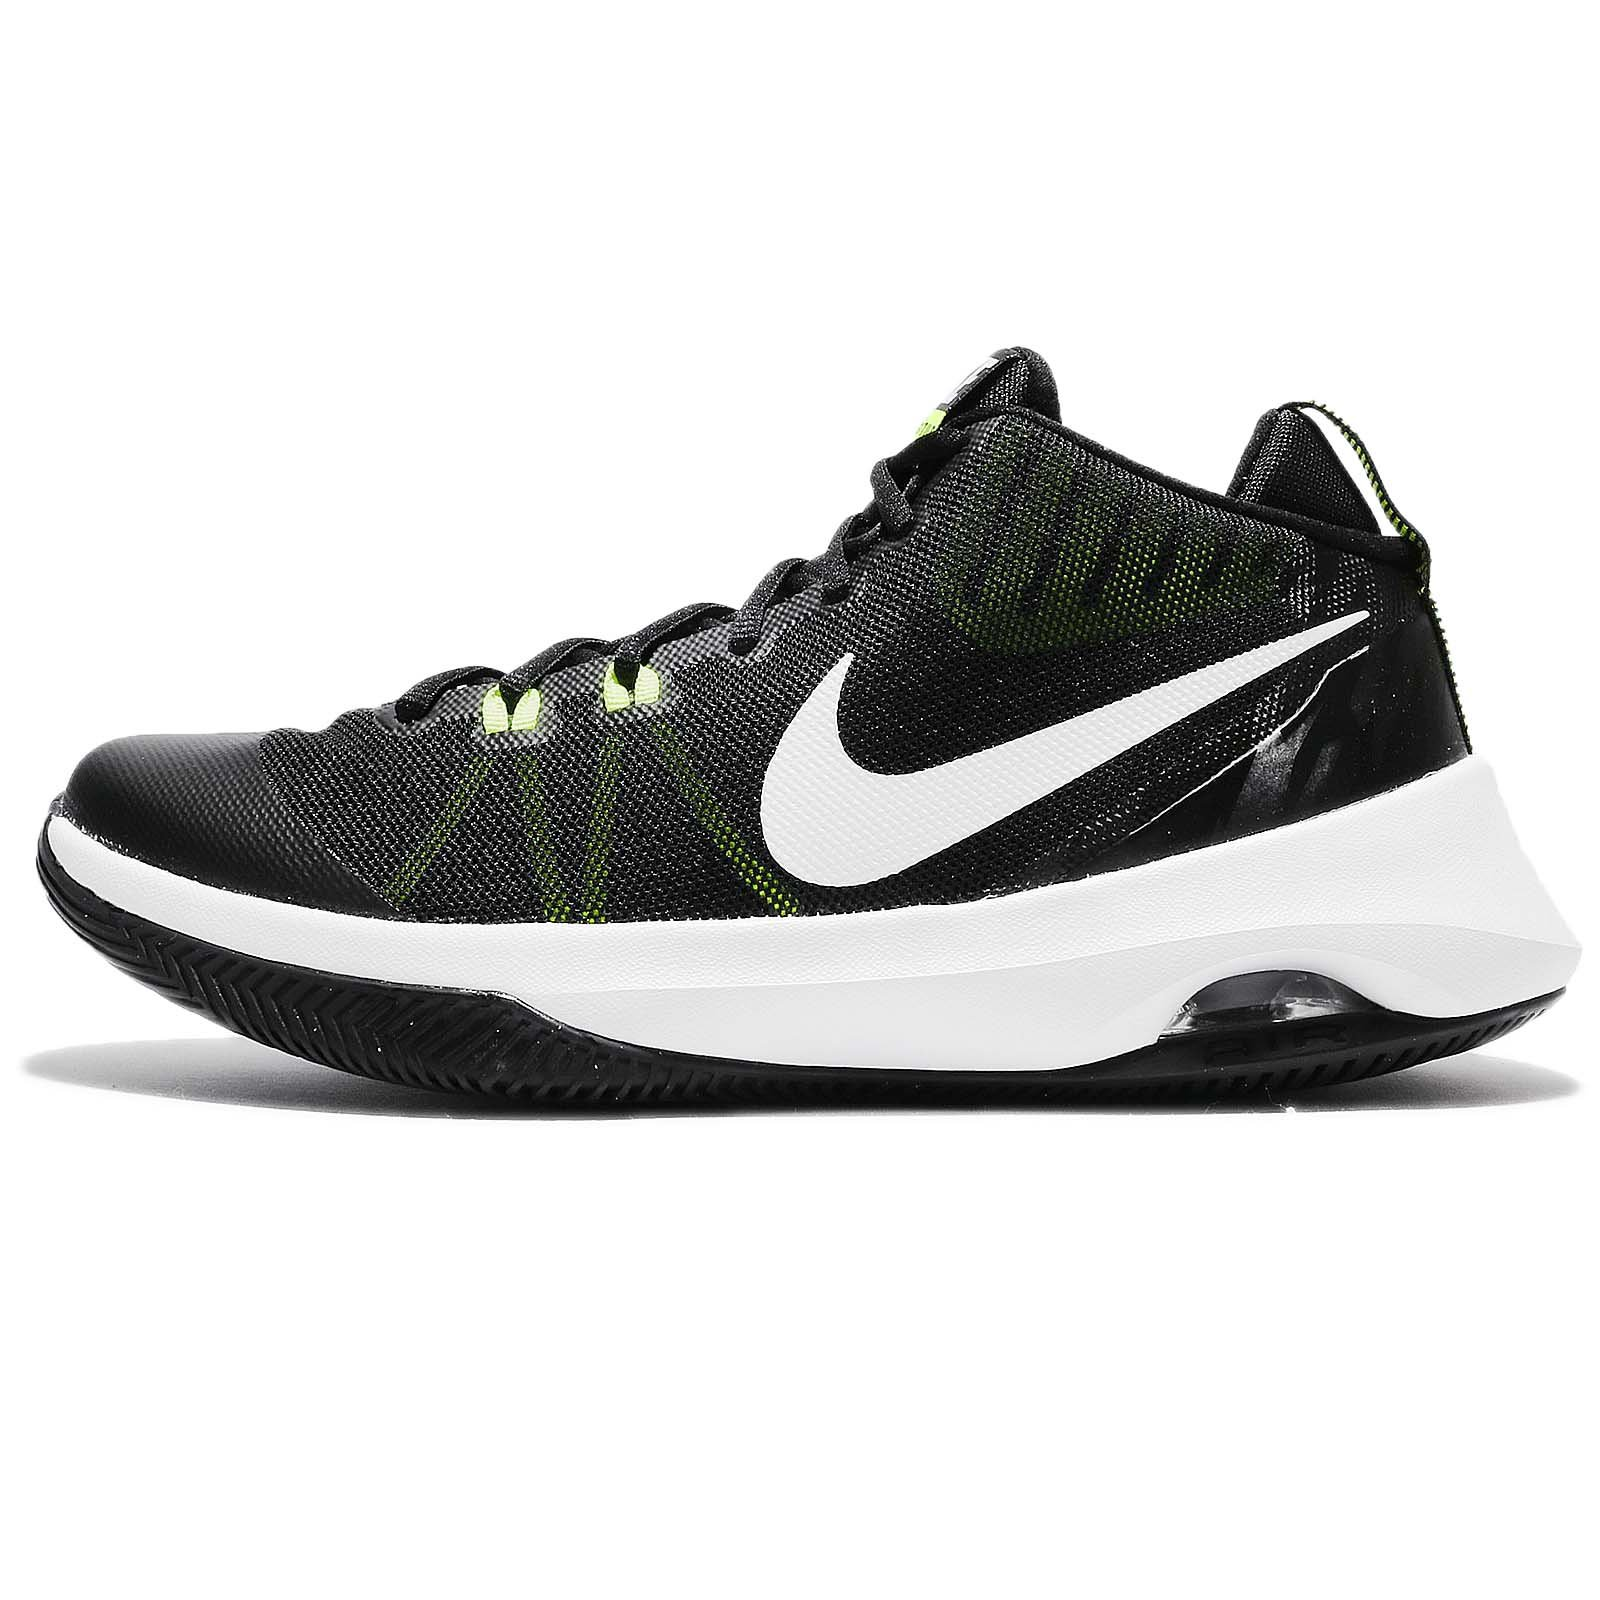 Nike Mens Air Versitile - 852431009 Black-Green-White (13) by NIKE